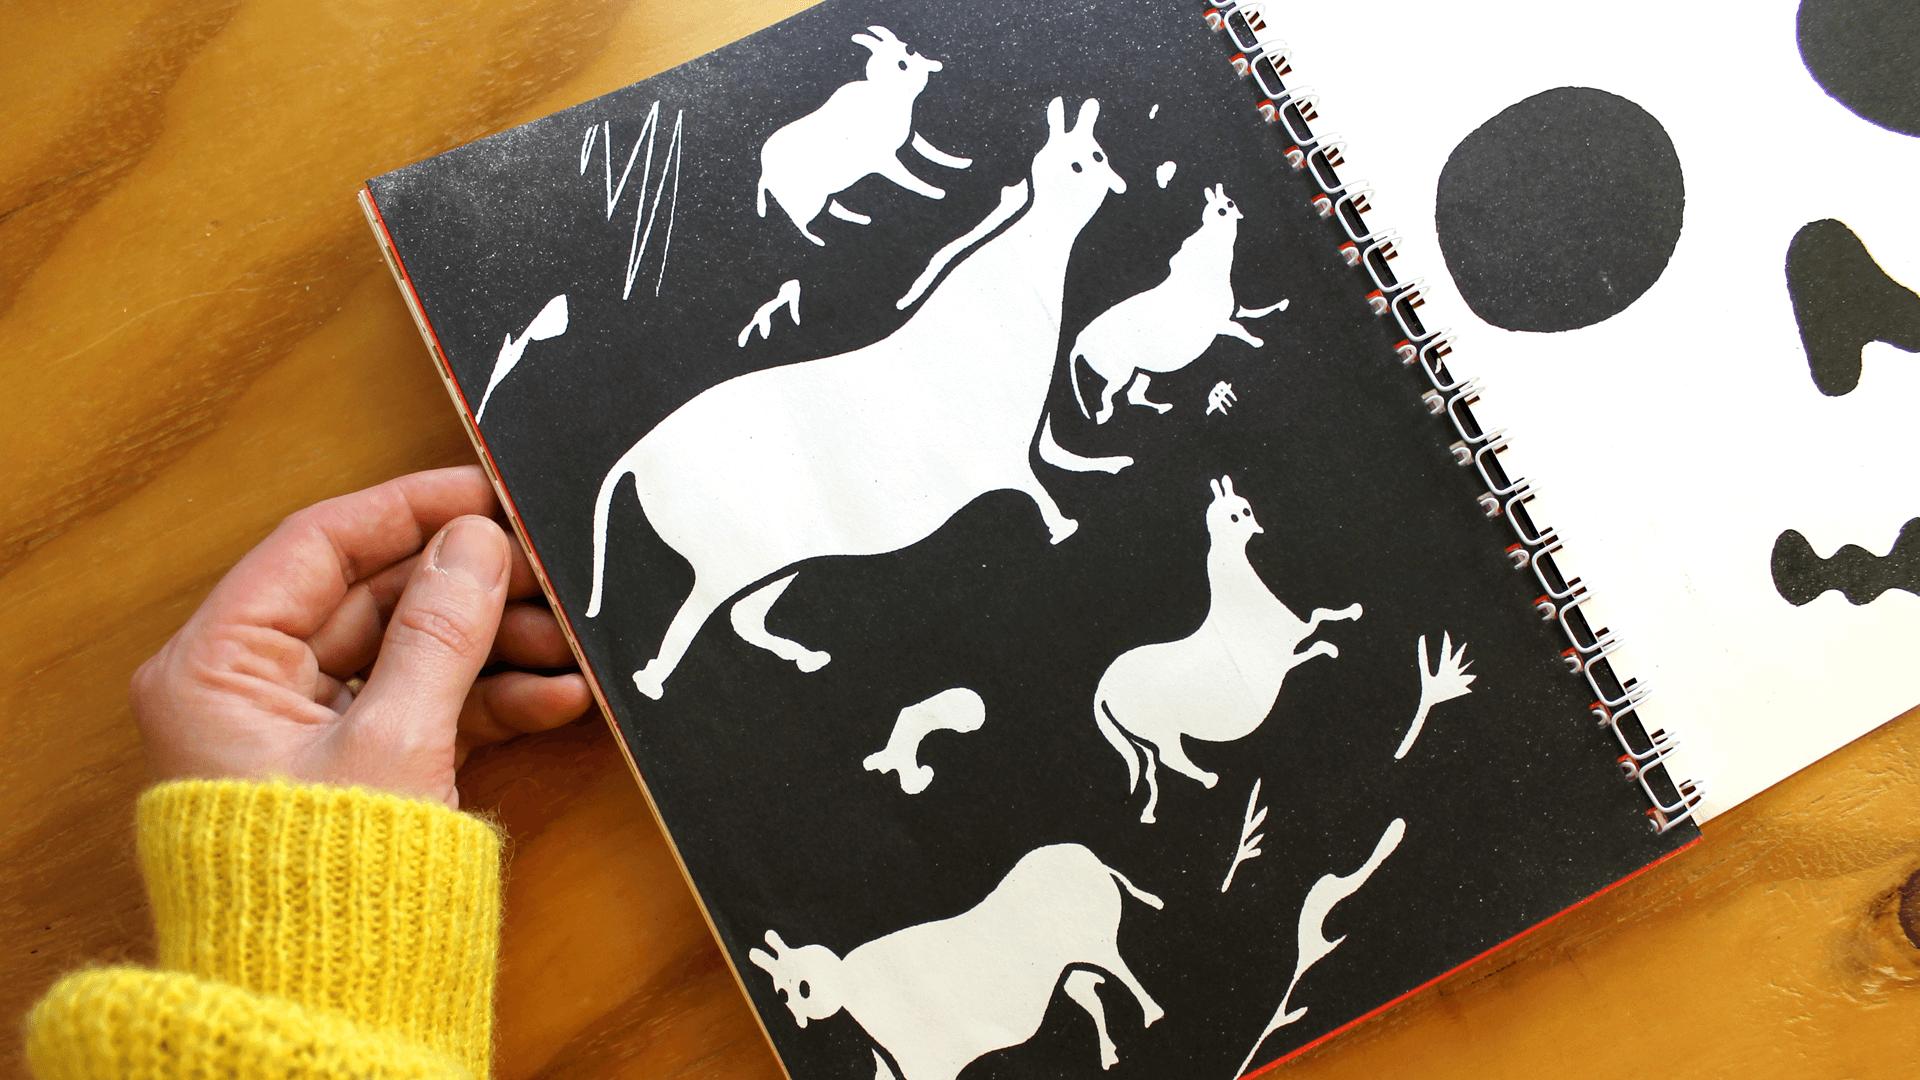 Studio Goof Julia Boehme Risography Mind the Back Book Design Illustration Leipzig